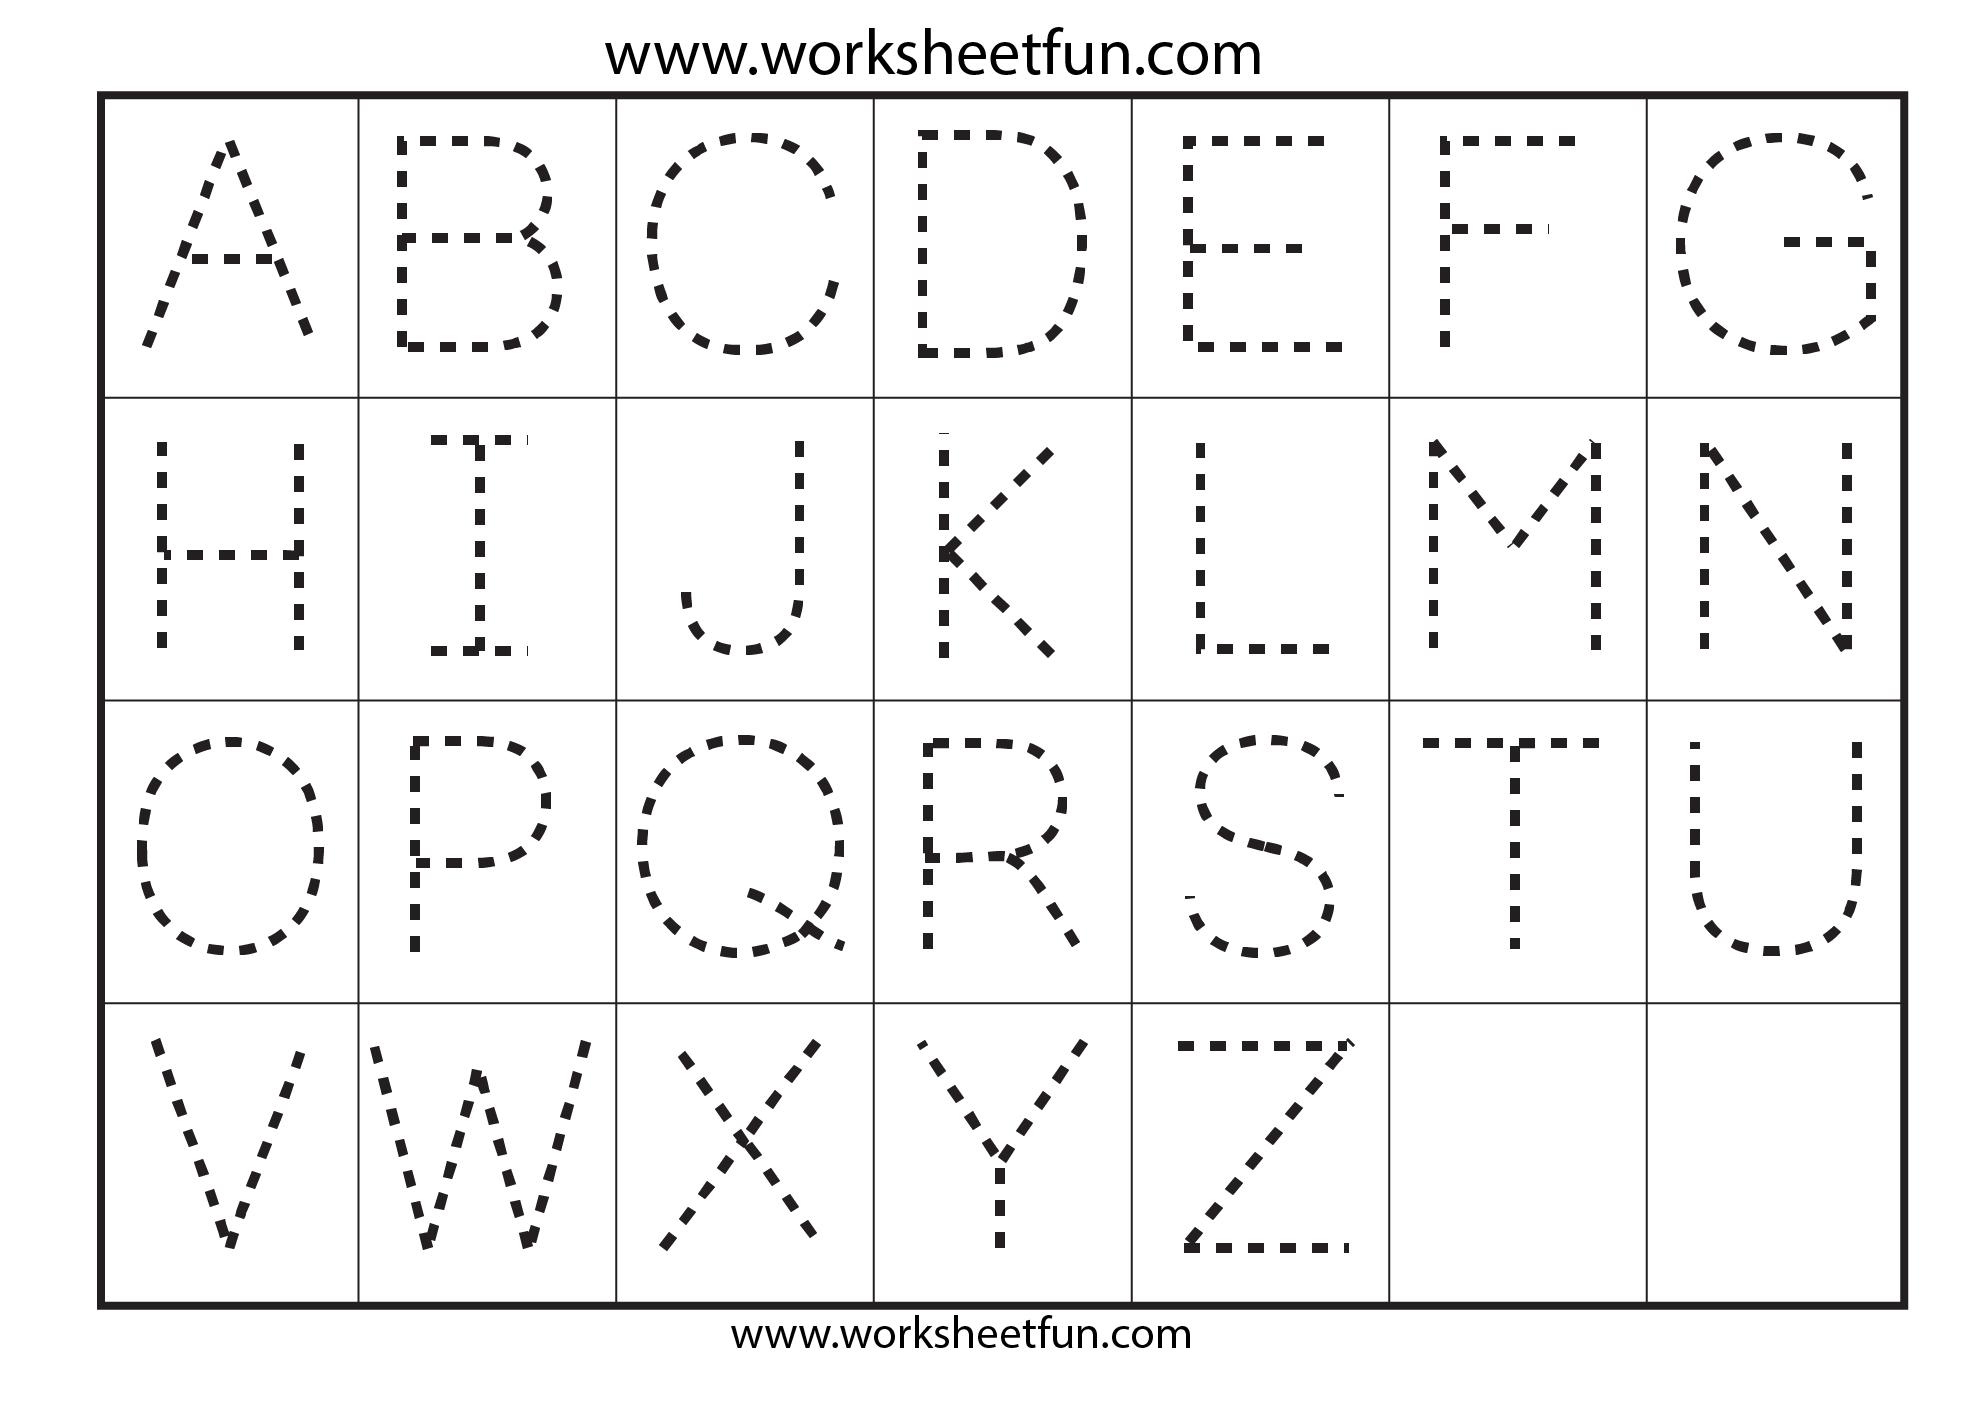 7 Best Images of Preschool Work Sheets Alphabet Printables ...